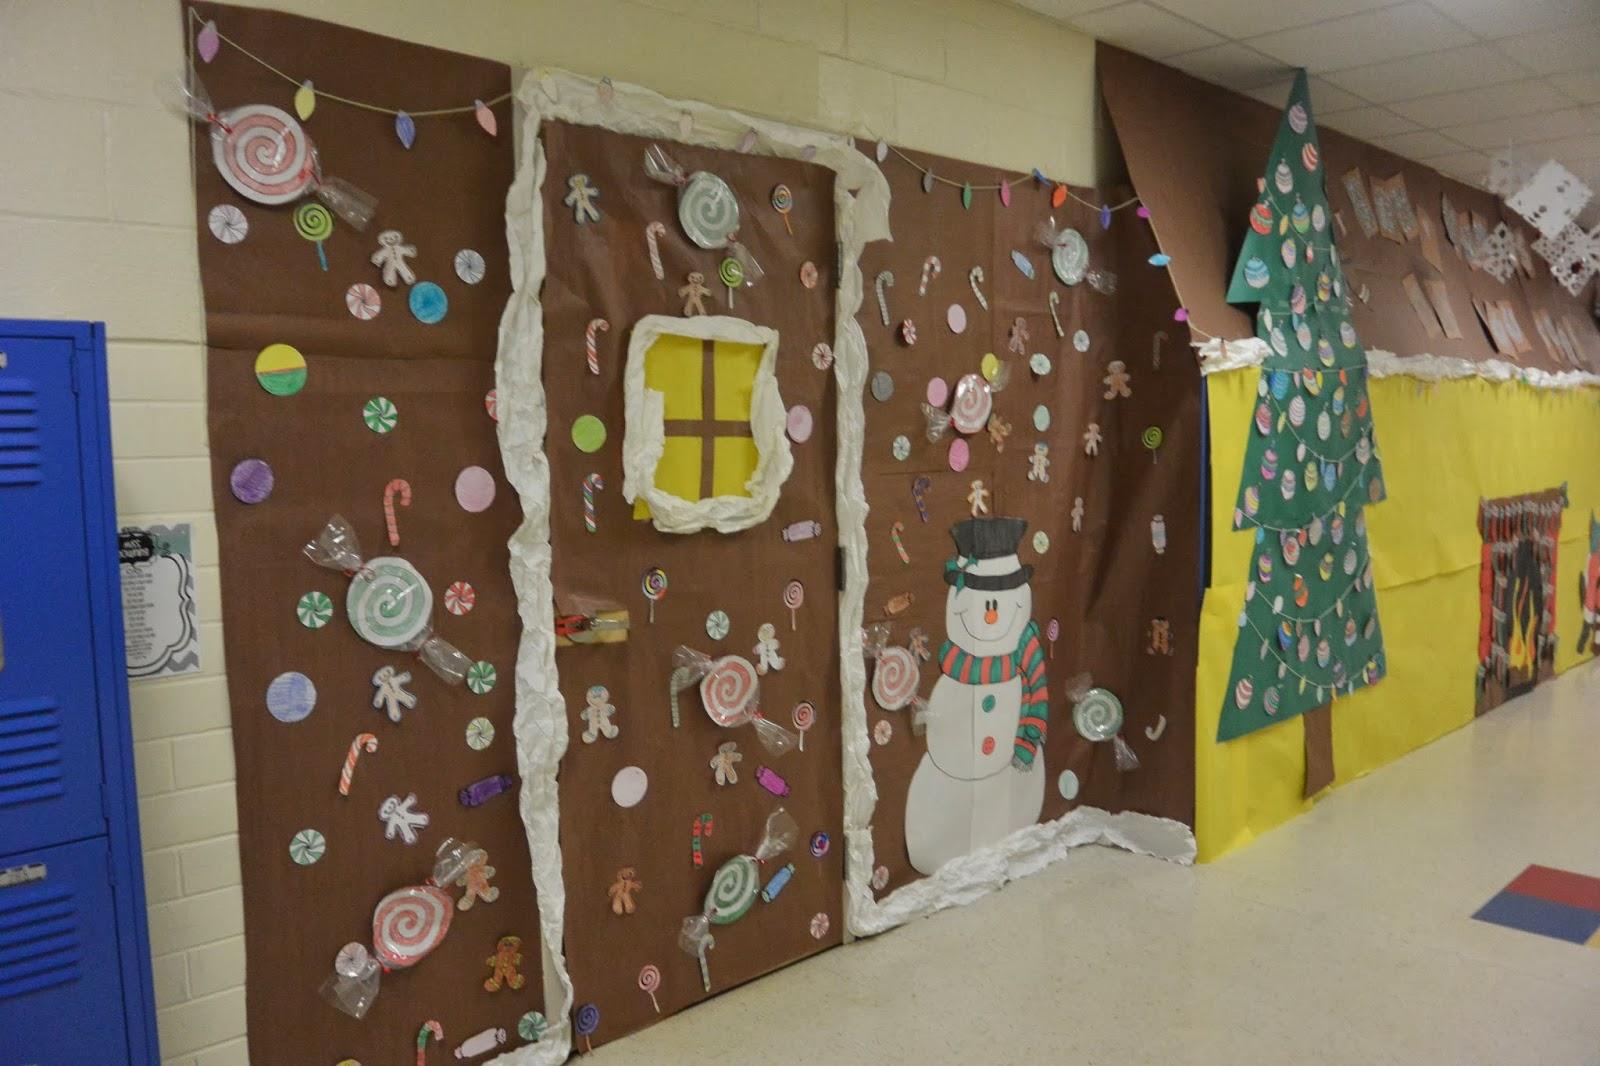 Merveilleux Christmas Bulletin Boards And School Decor